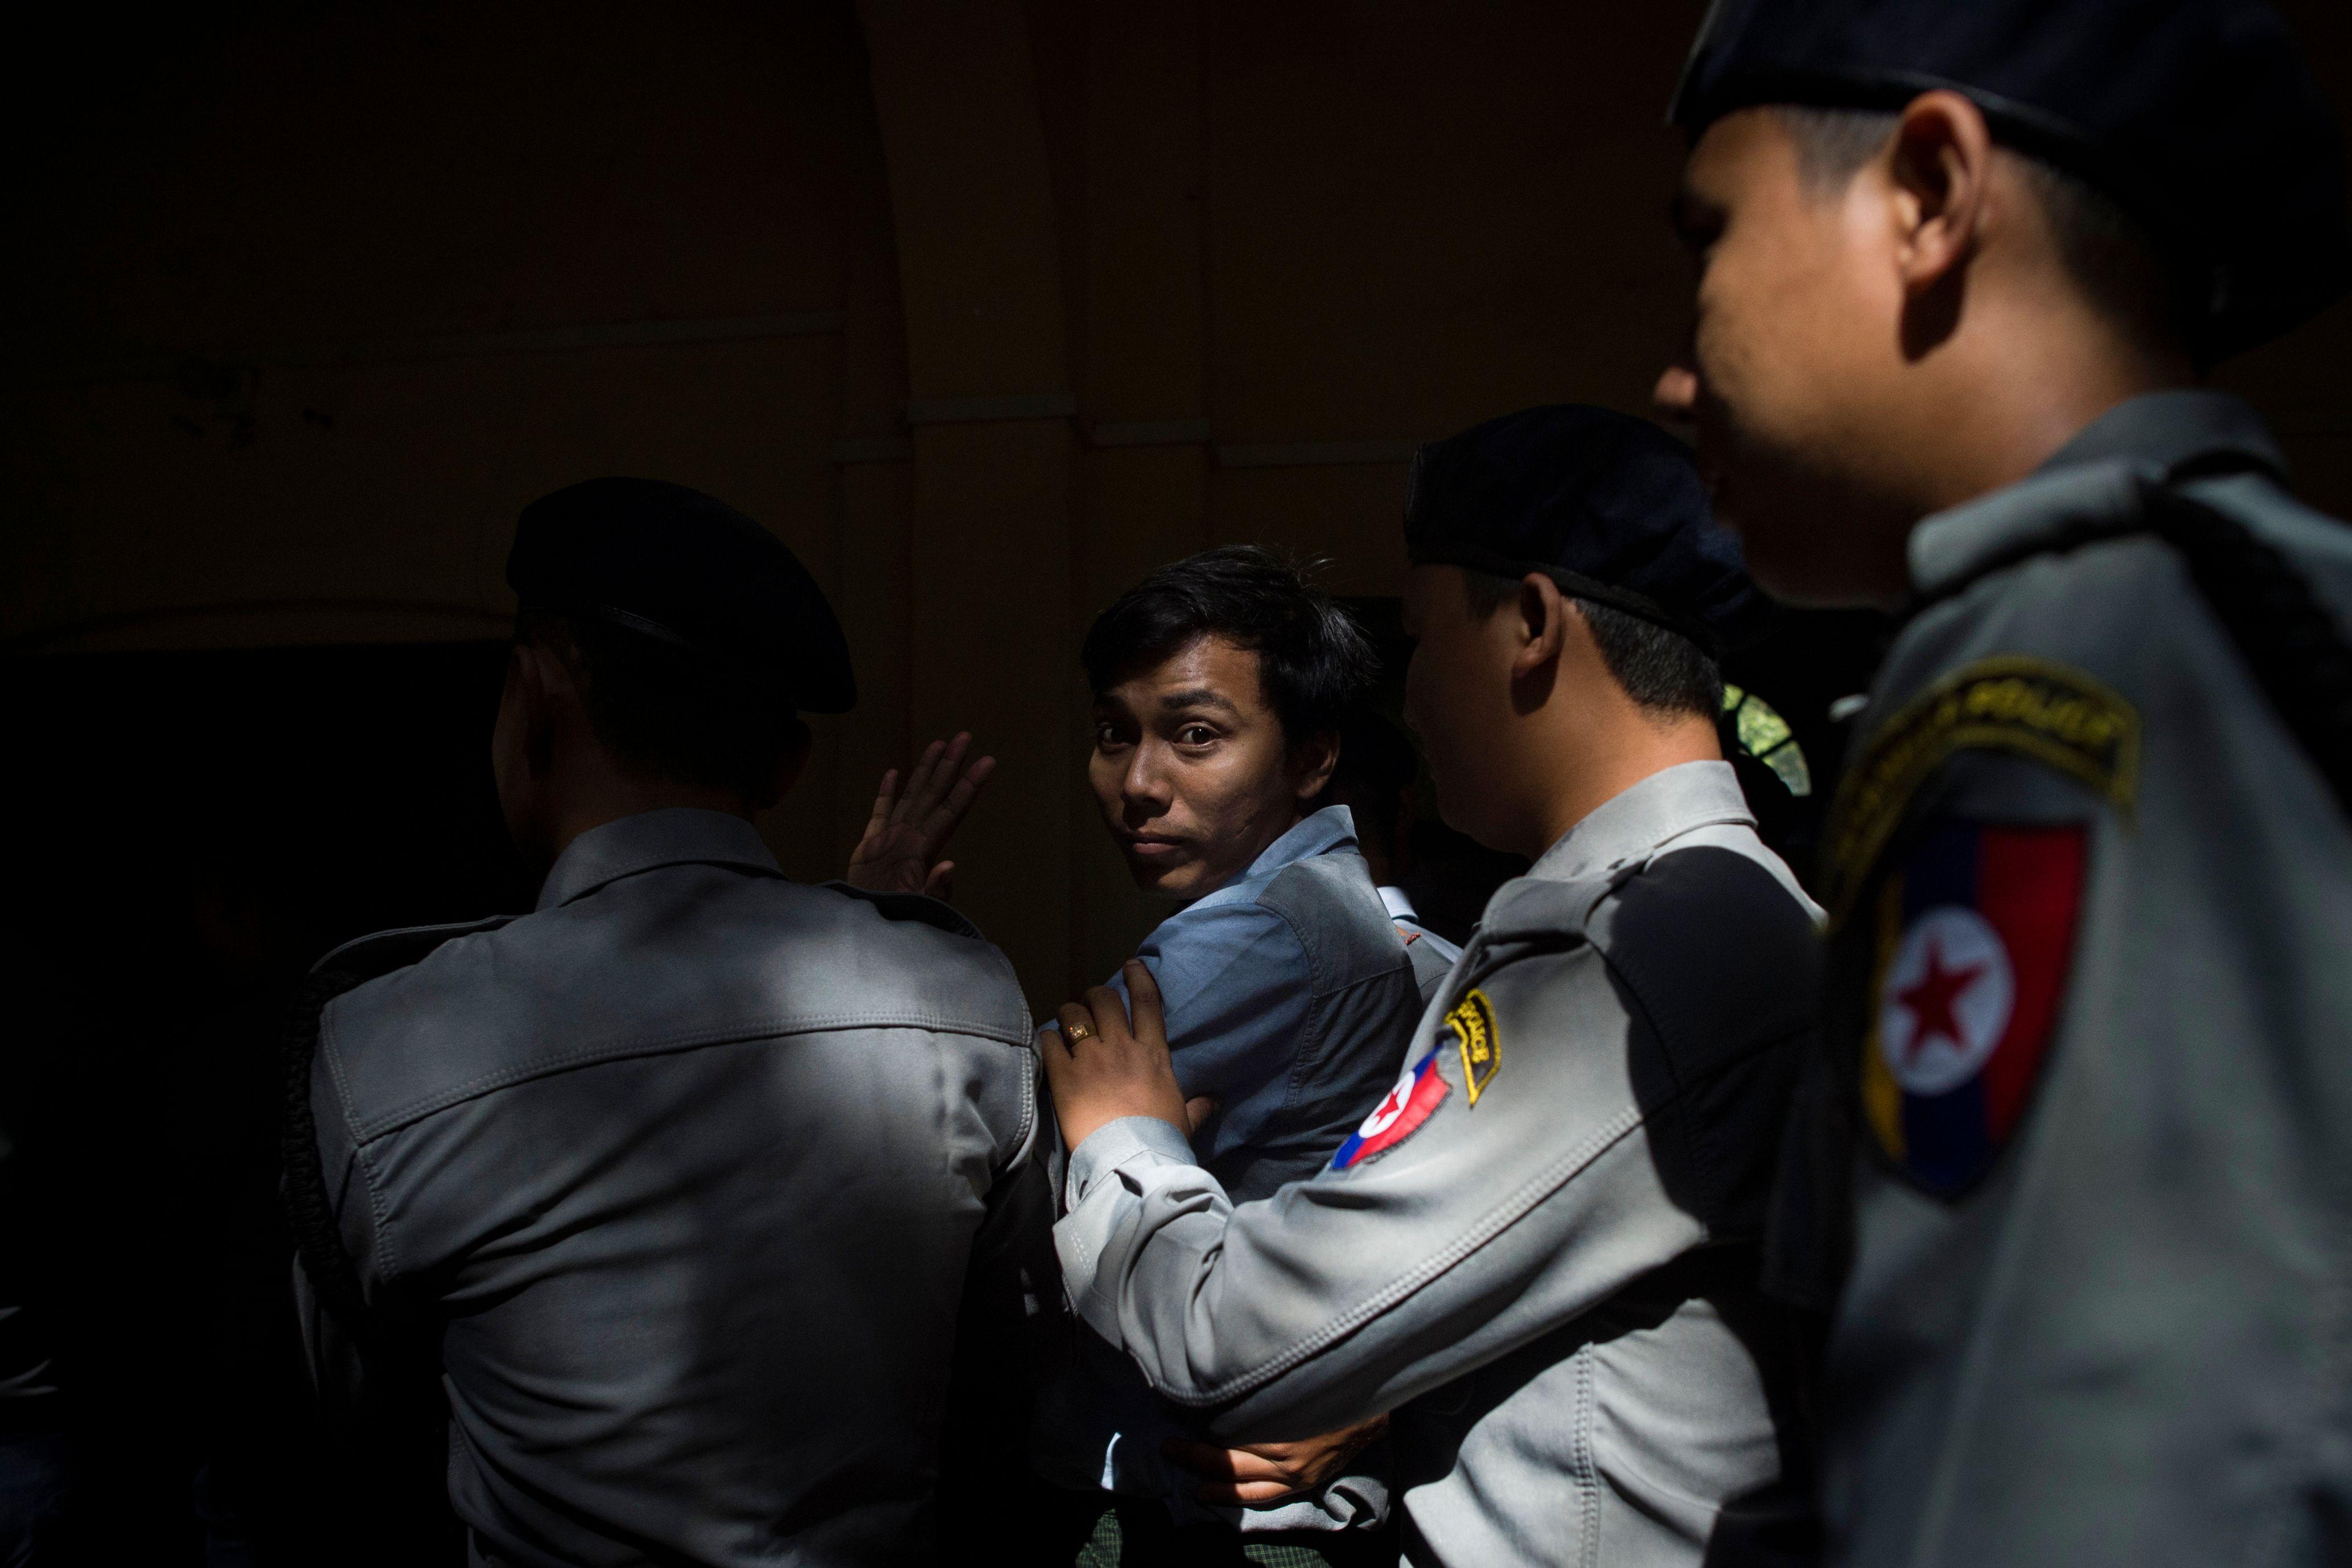 Reuters journalist Kyaw Soe Oo is escorted by police after a court appearance in Yangon, Myanmar on Jan. 10, 2018.